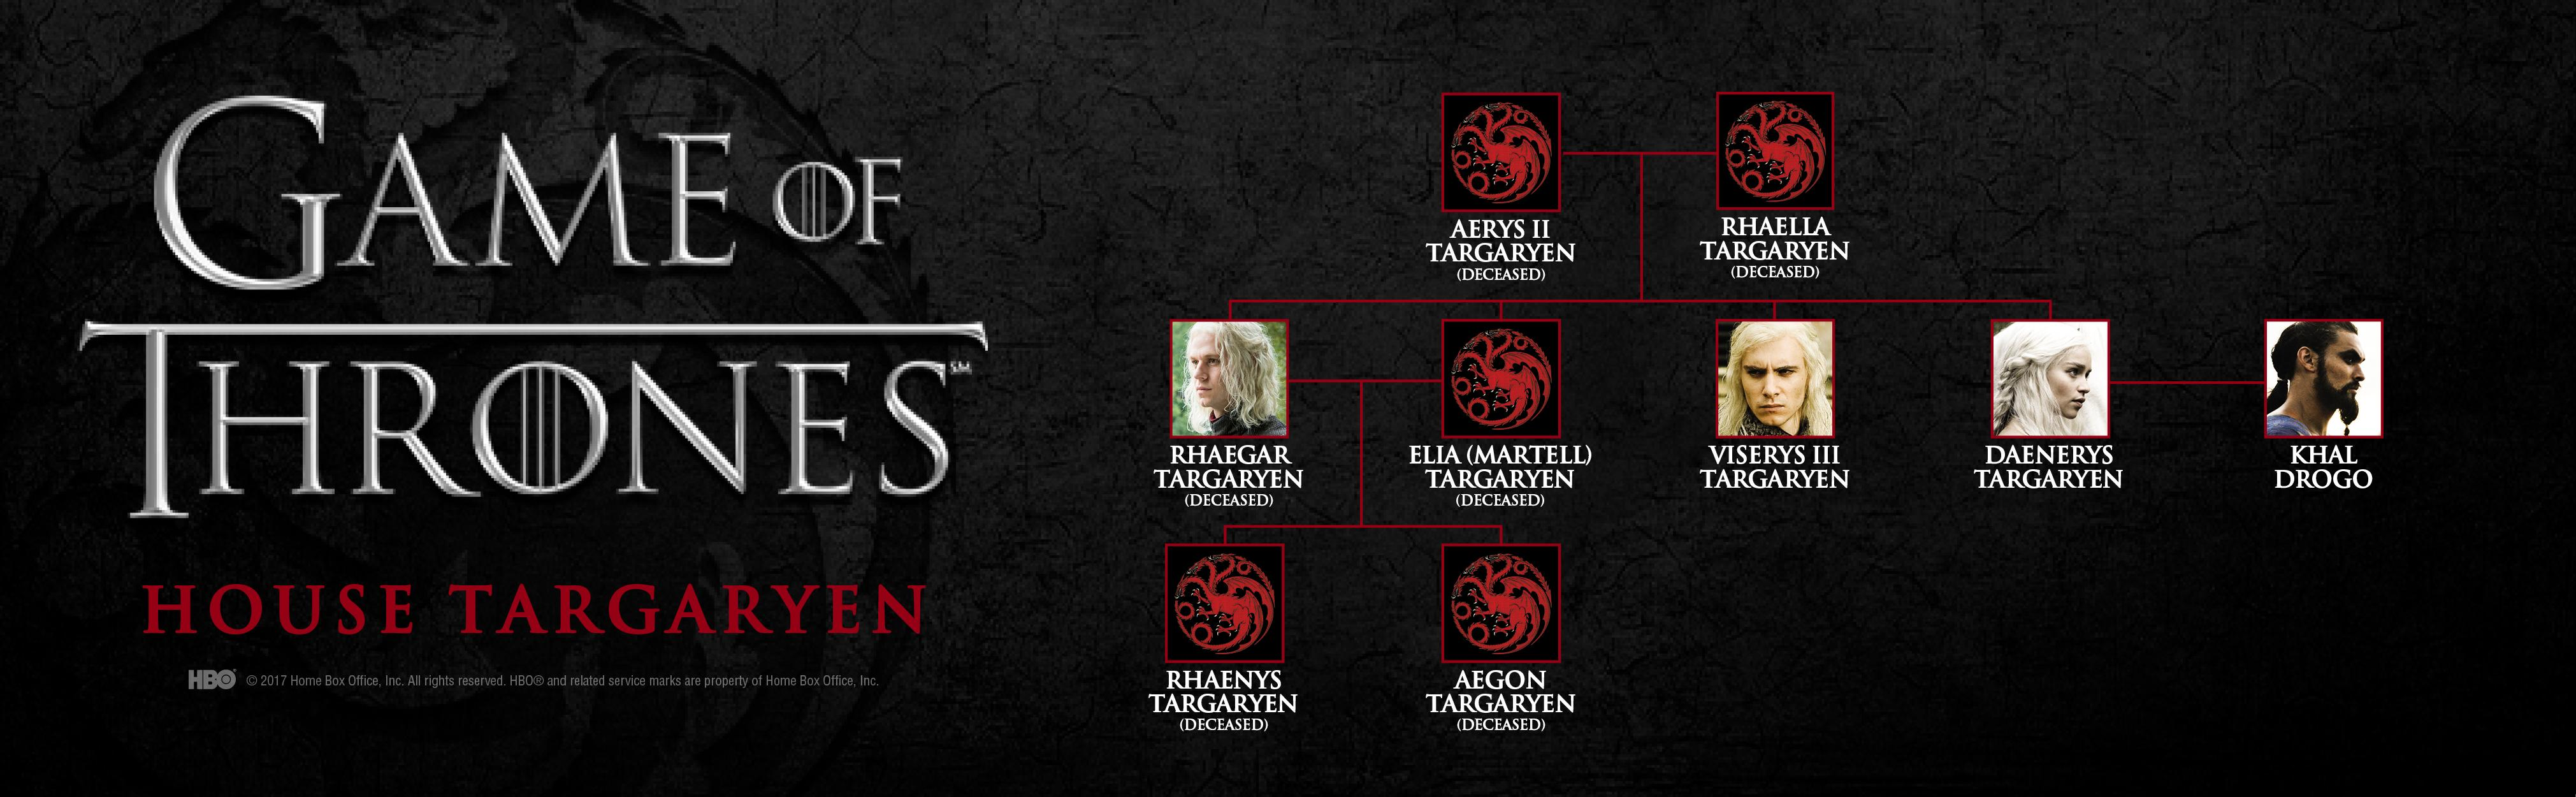 game of thrones season 1 dvd 2012 amazoncouk